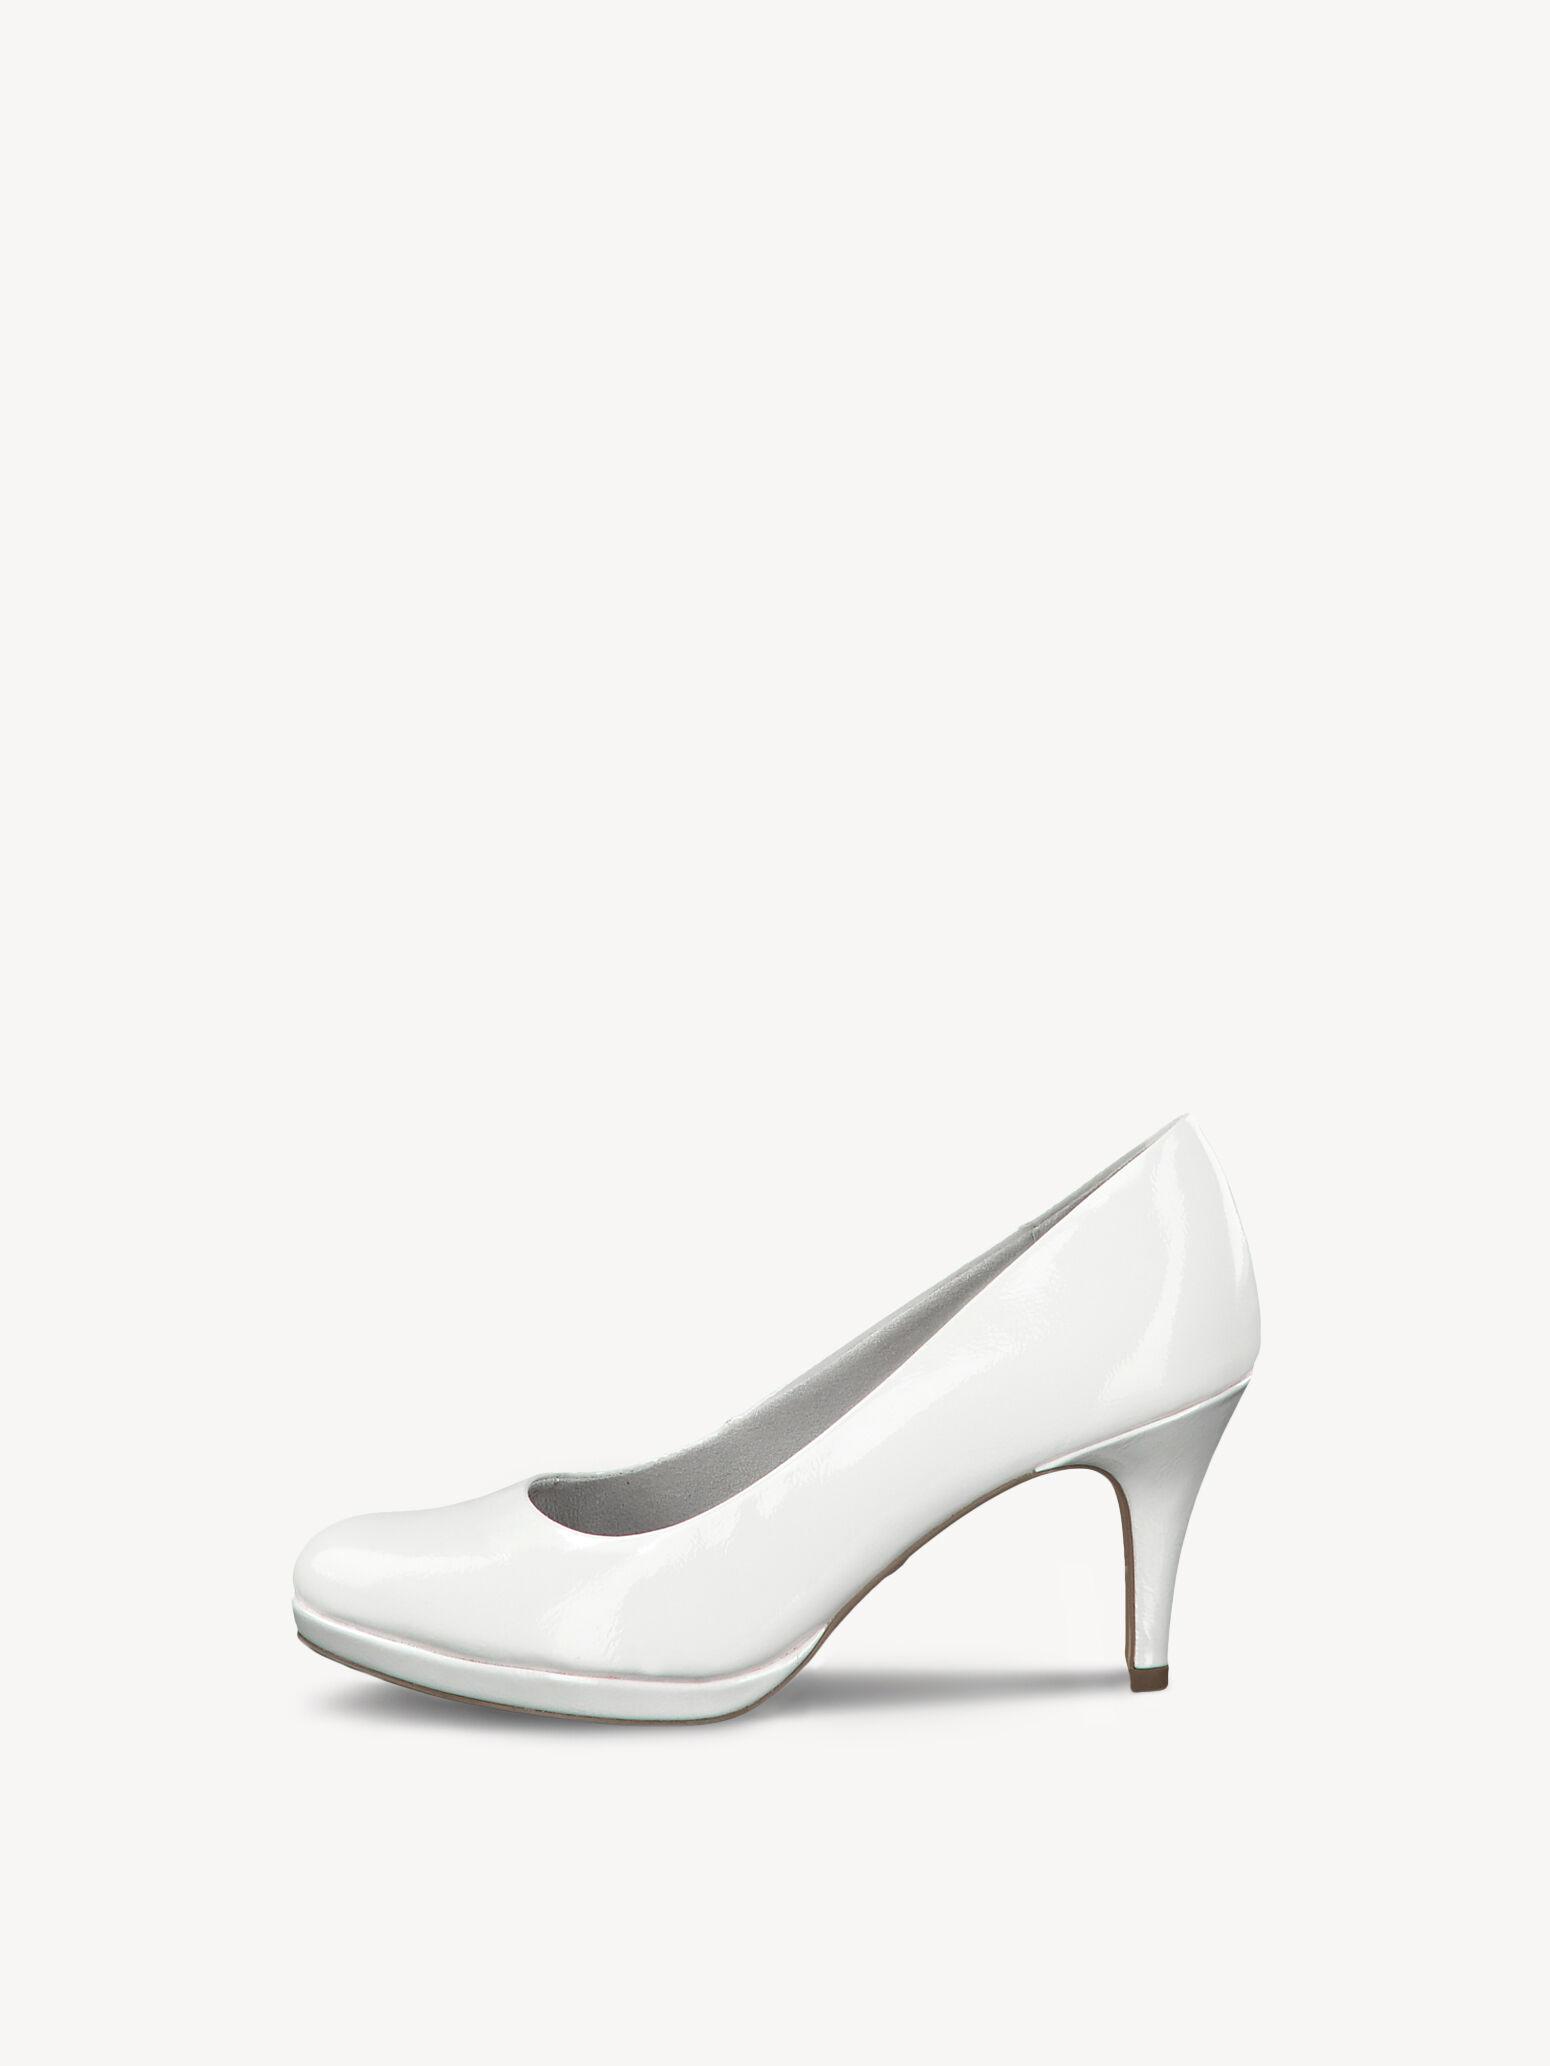 Tamaris Chaussures Tamaris Femmes Chaussures Femmes Femmes